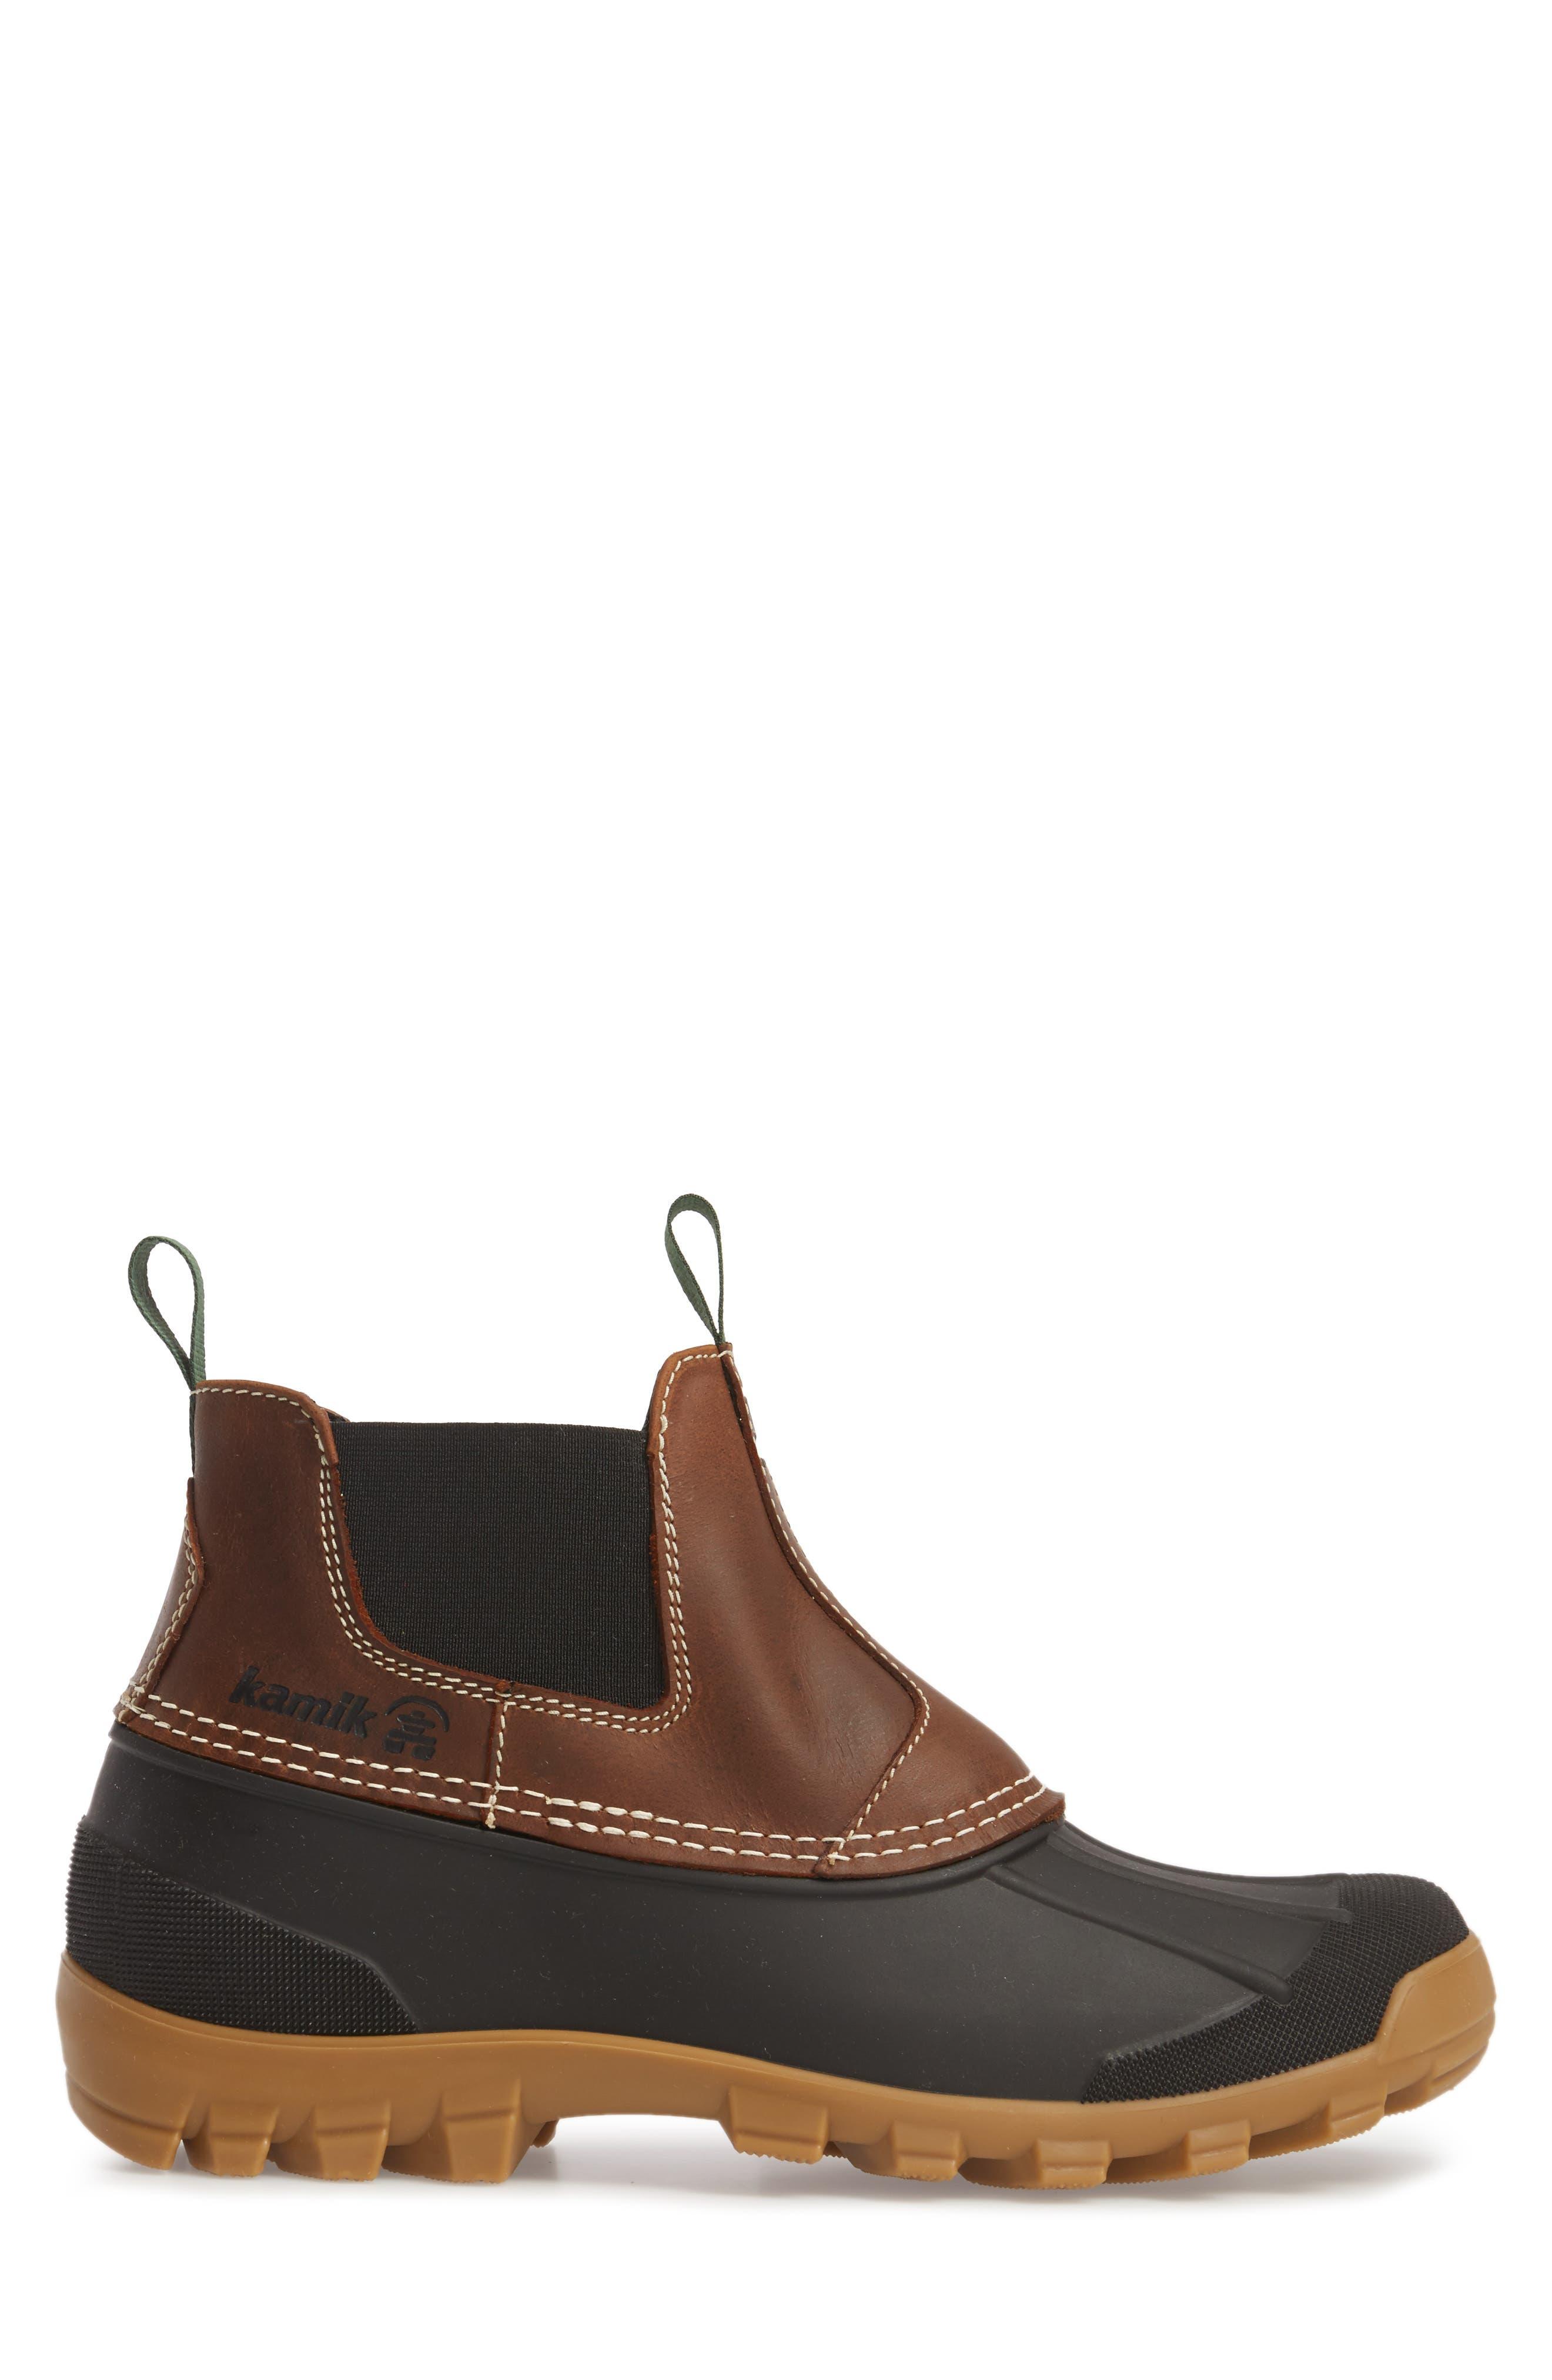 Yukon Chelsea Boot,                             Alternate thumbnail 3, color,                             Dark Brown Leather